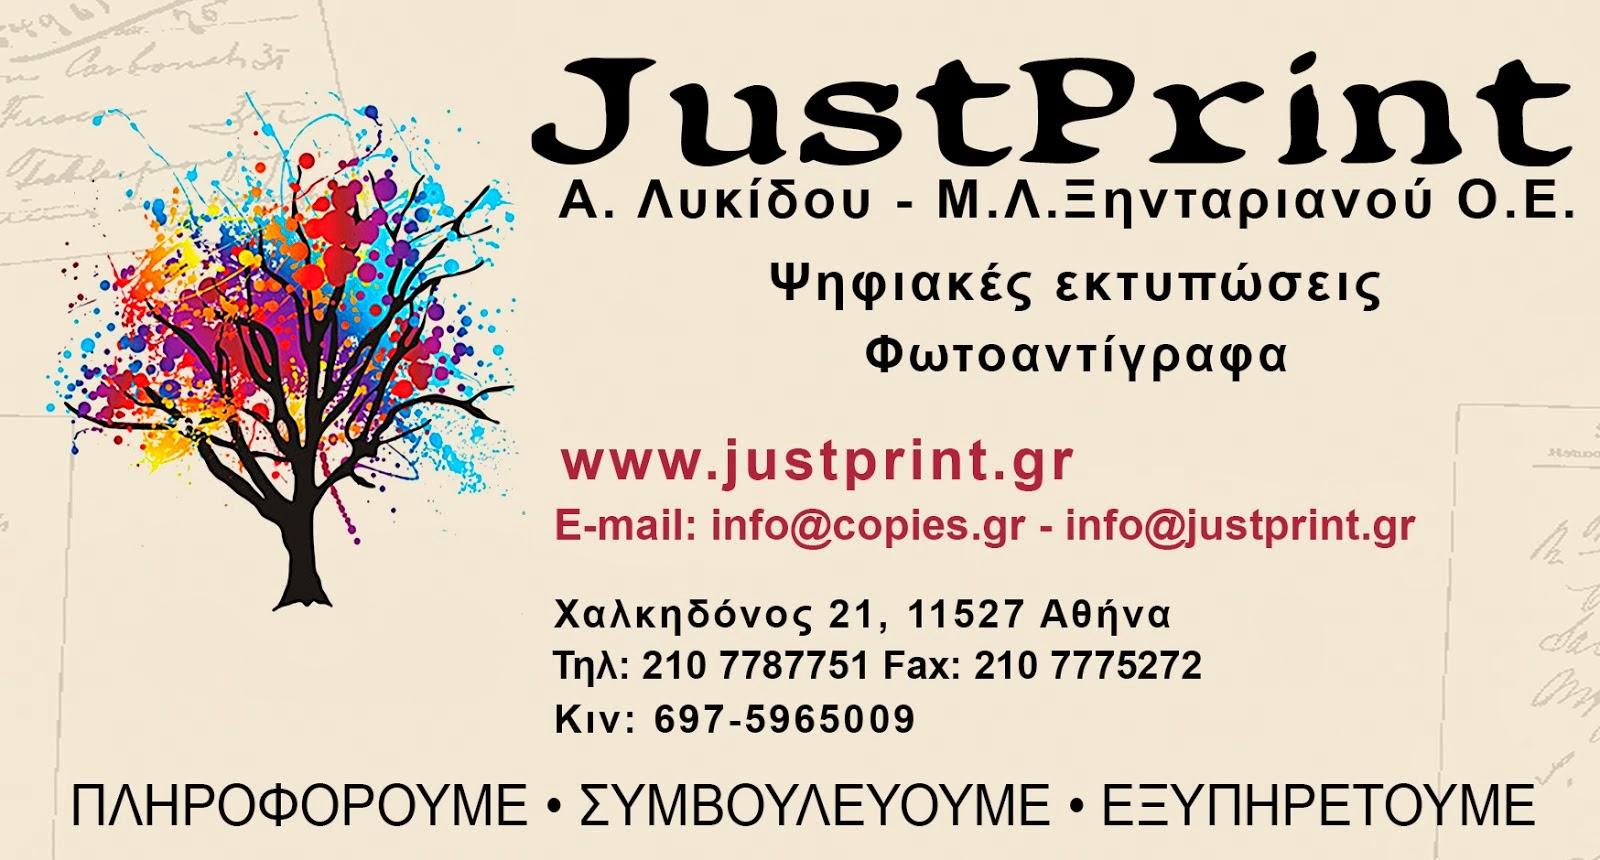 JustPrint